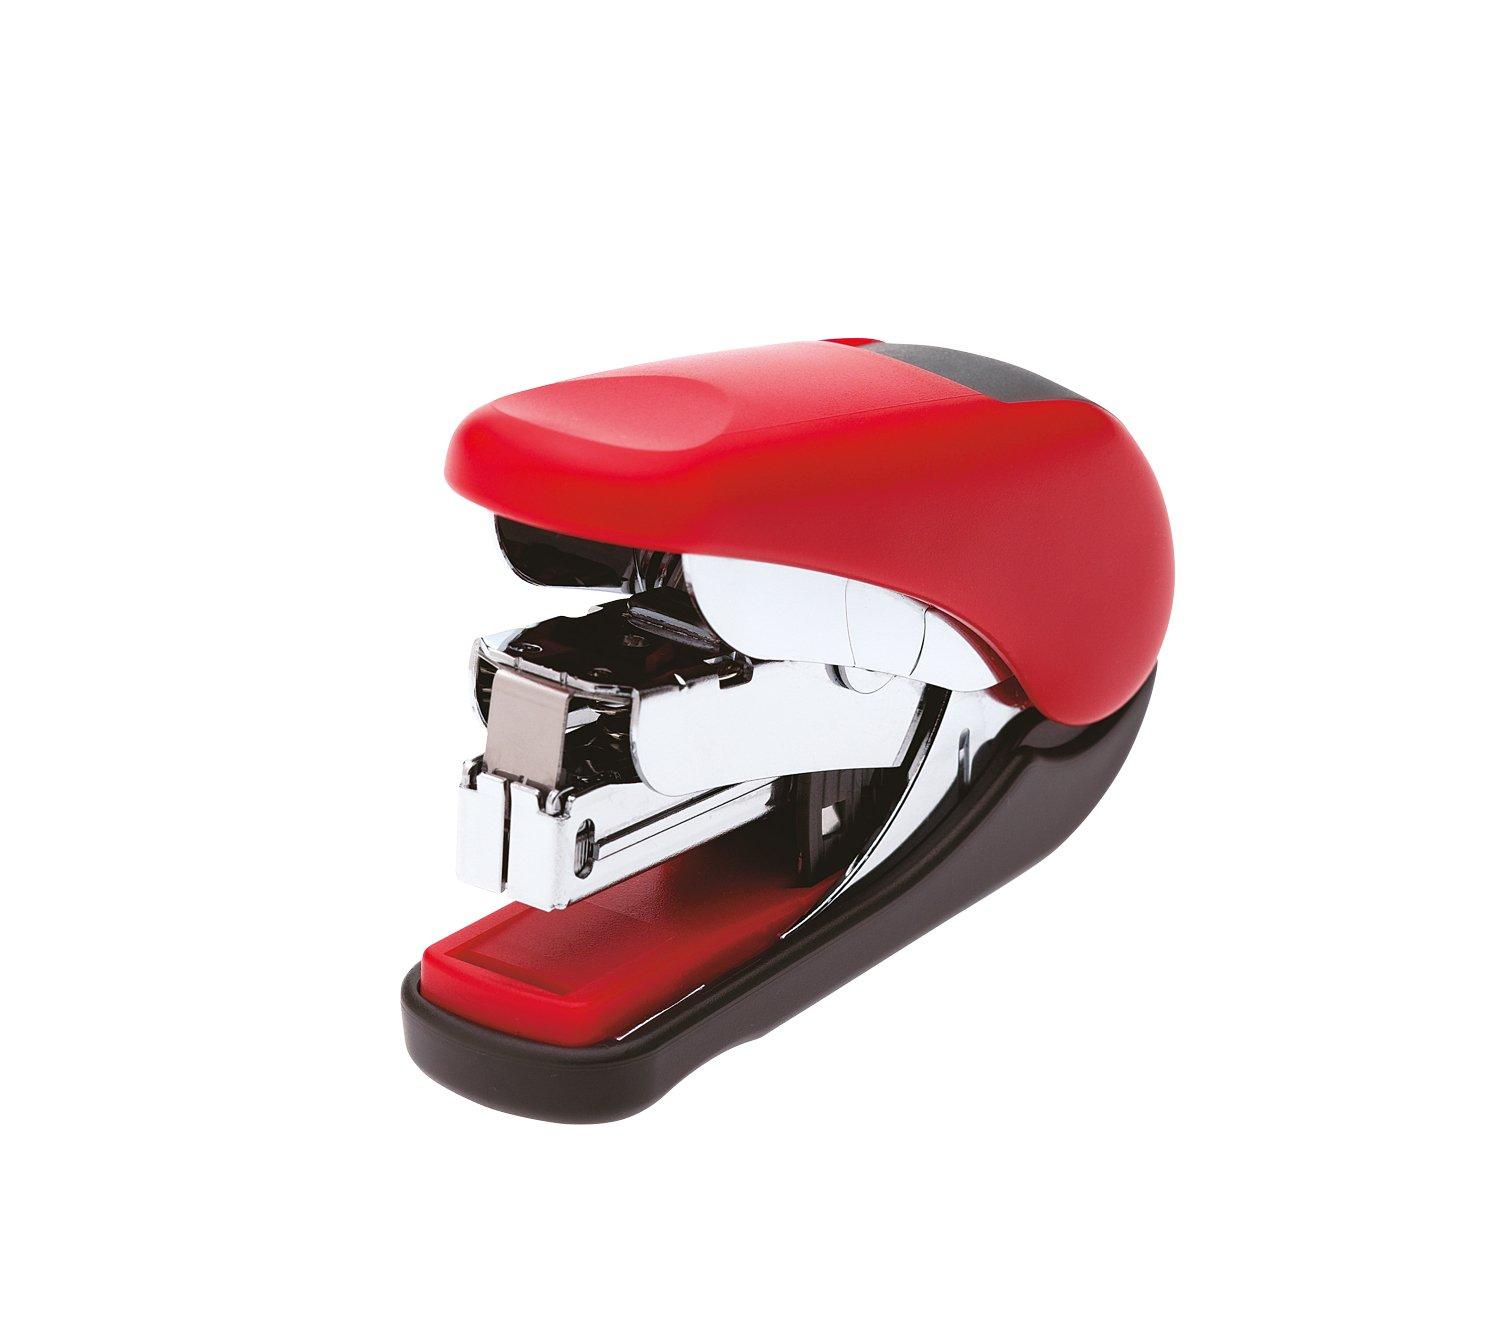 PLUS Japan Mini cucitrice a meccanismo facilitato ST-010V fino a 20 fogli, bianca, punti n. 10 Plus Europe GmbH ST-010V WHITE